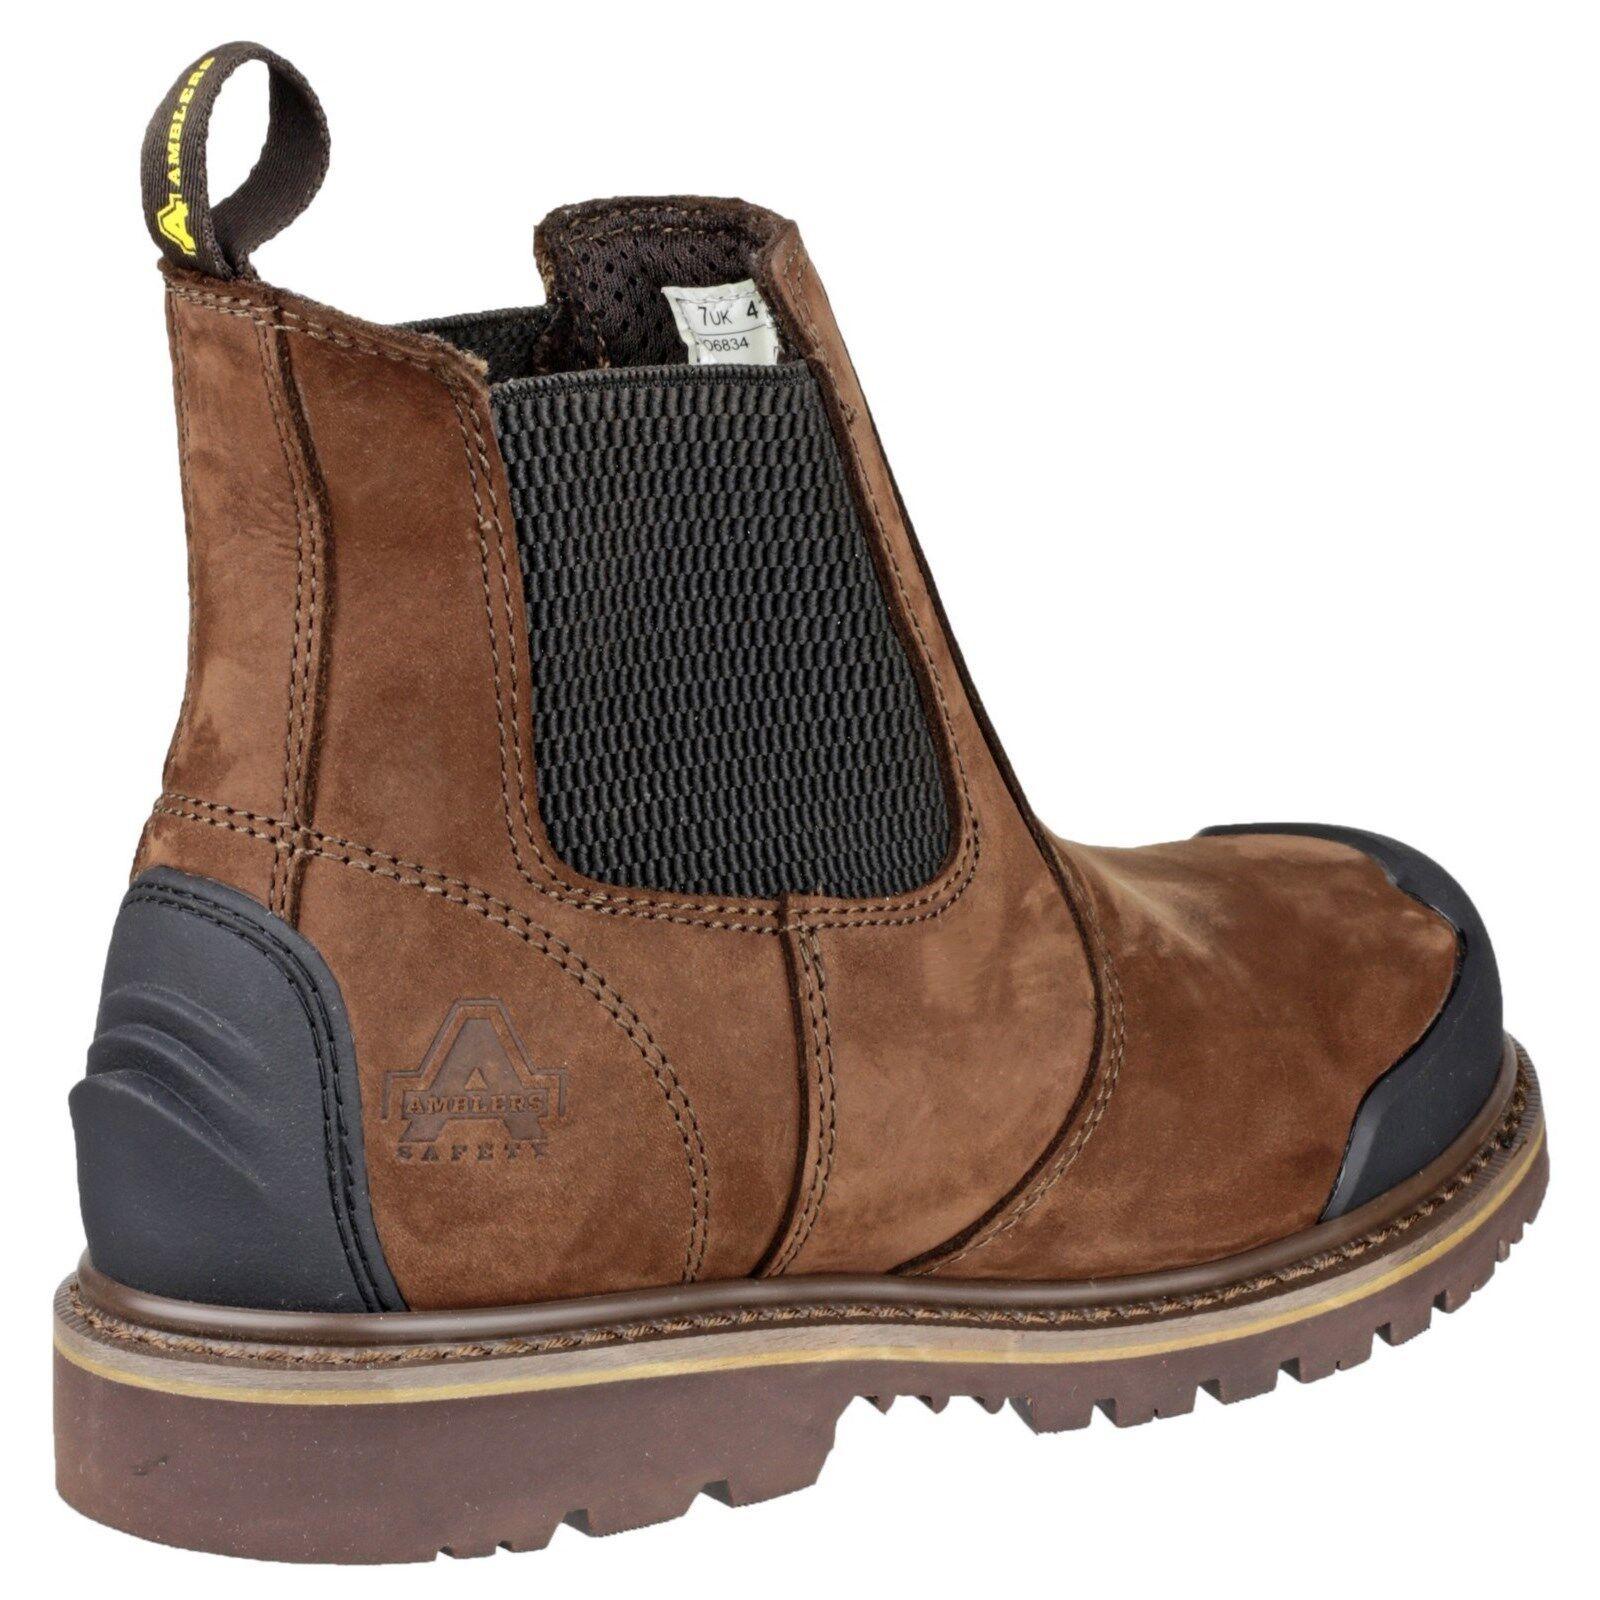 MENS AMBLERS FS996 WATERPROOF SAFETY WORK BOOTS SHOES HIKER  STEEL TOE CAP SIZE